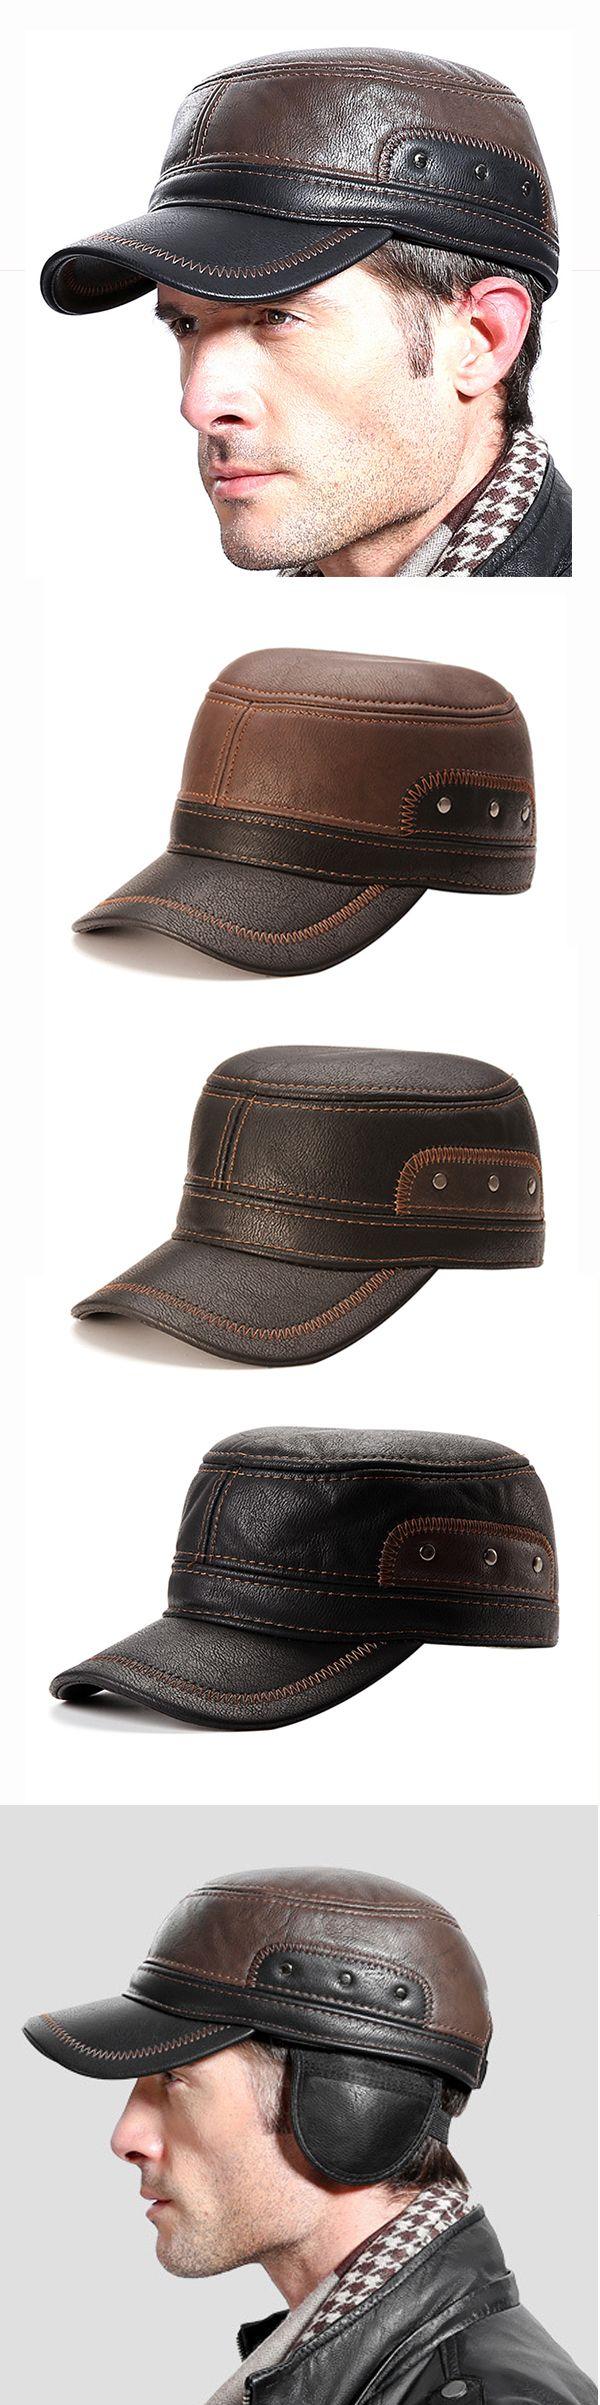 US$17.02 (48% OFF) Men Warm Earflaps Leather Cap / Flat Trucker Outdoor Sports Baseball Cap